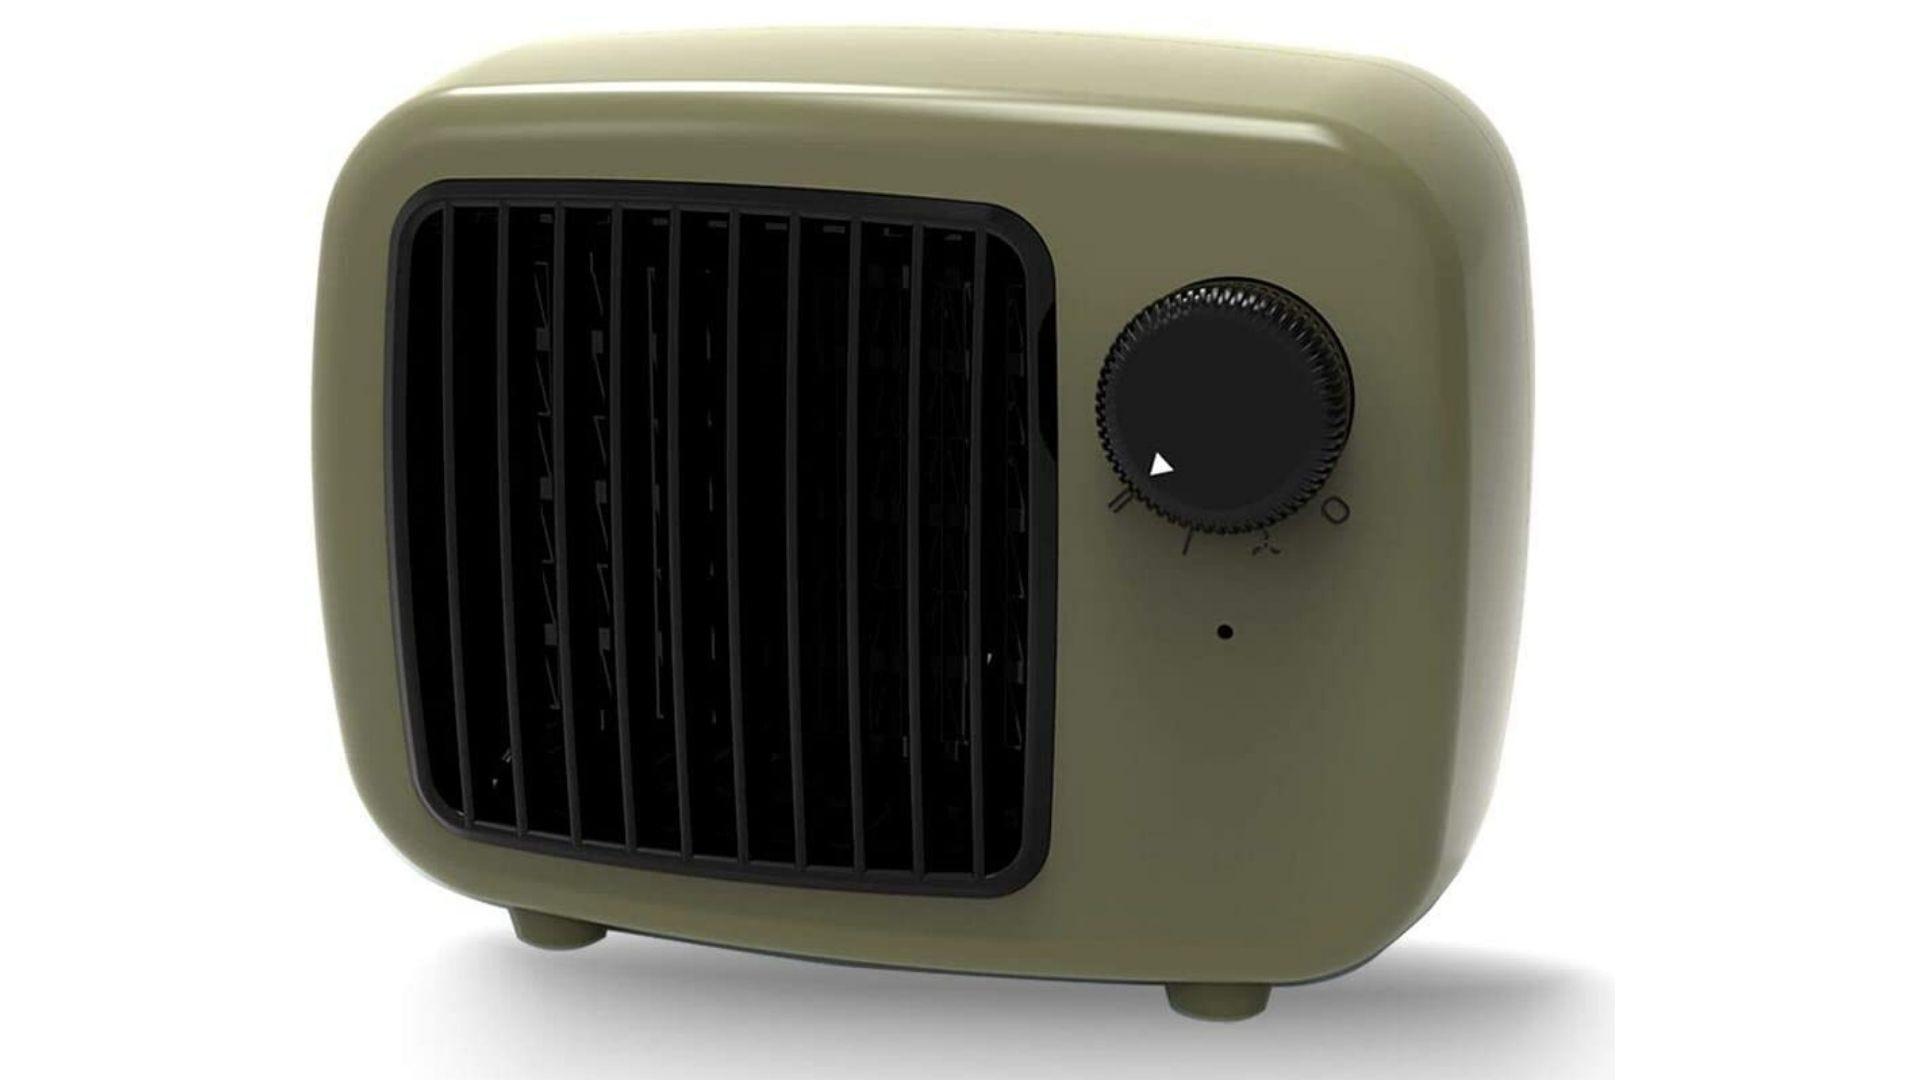 Cute green space heater.